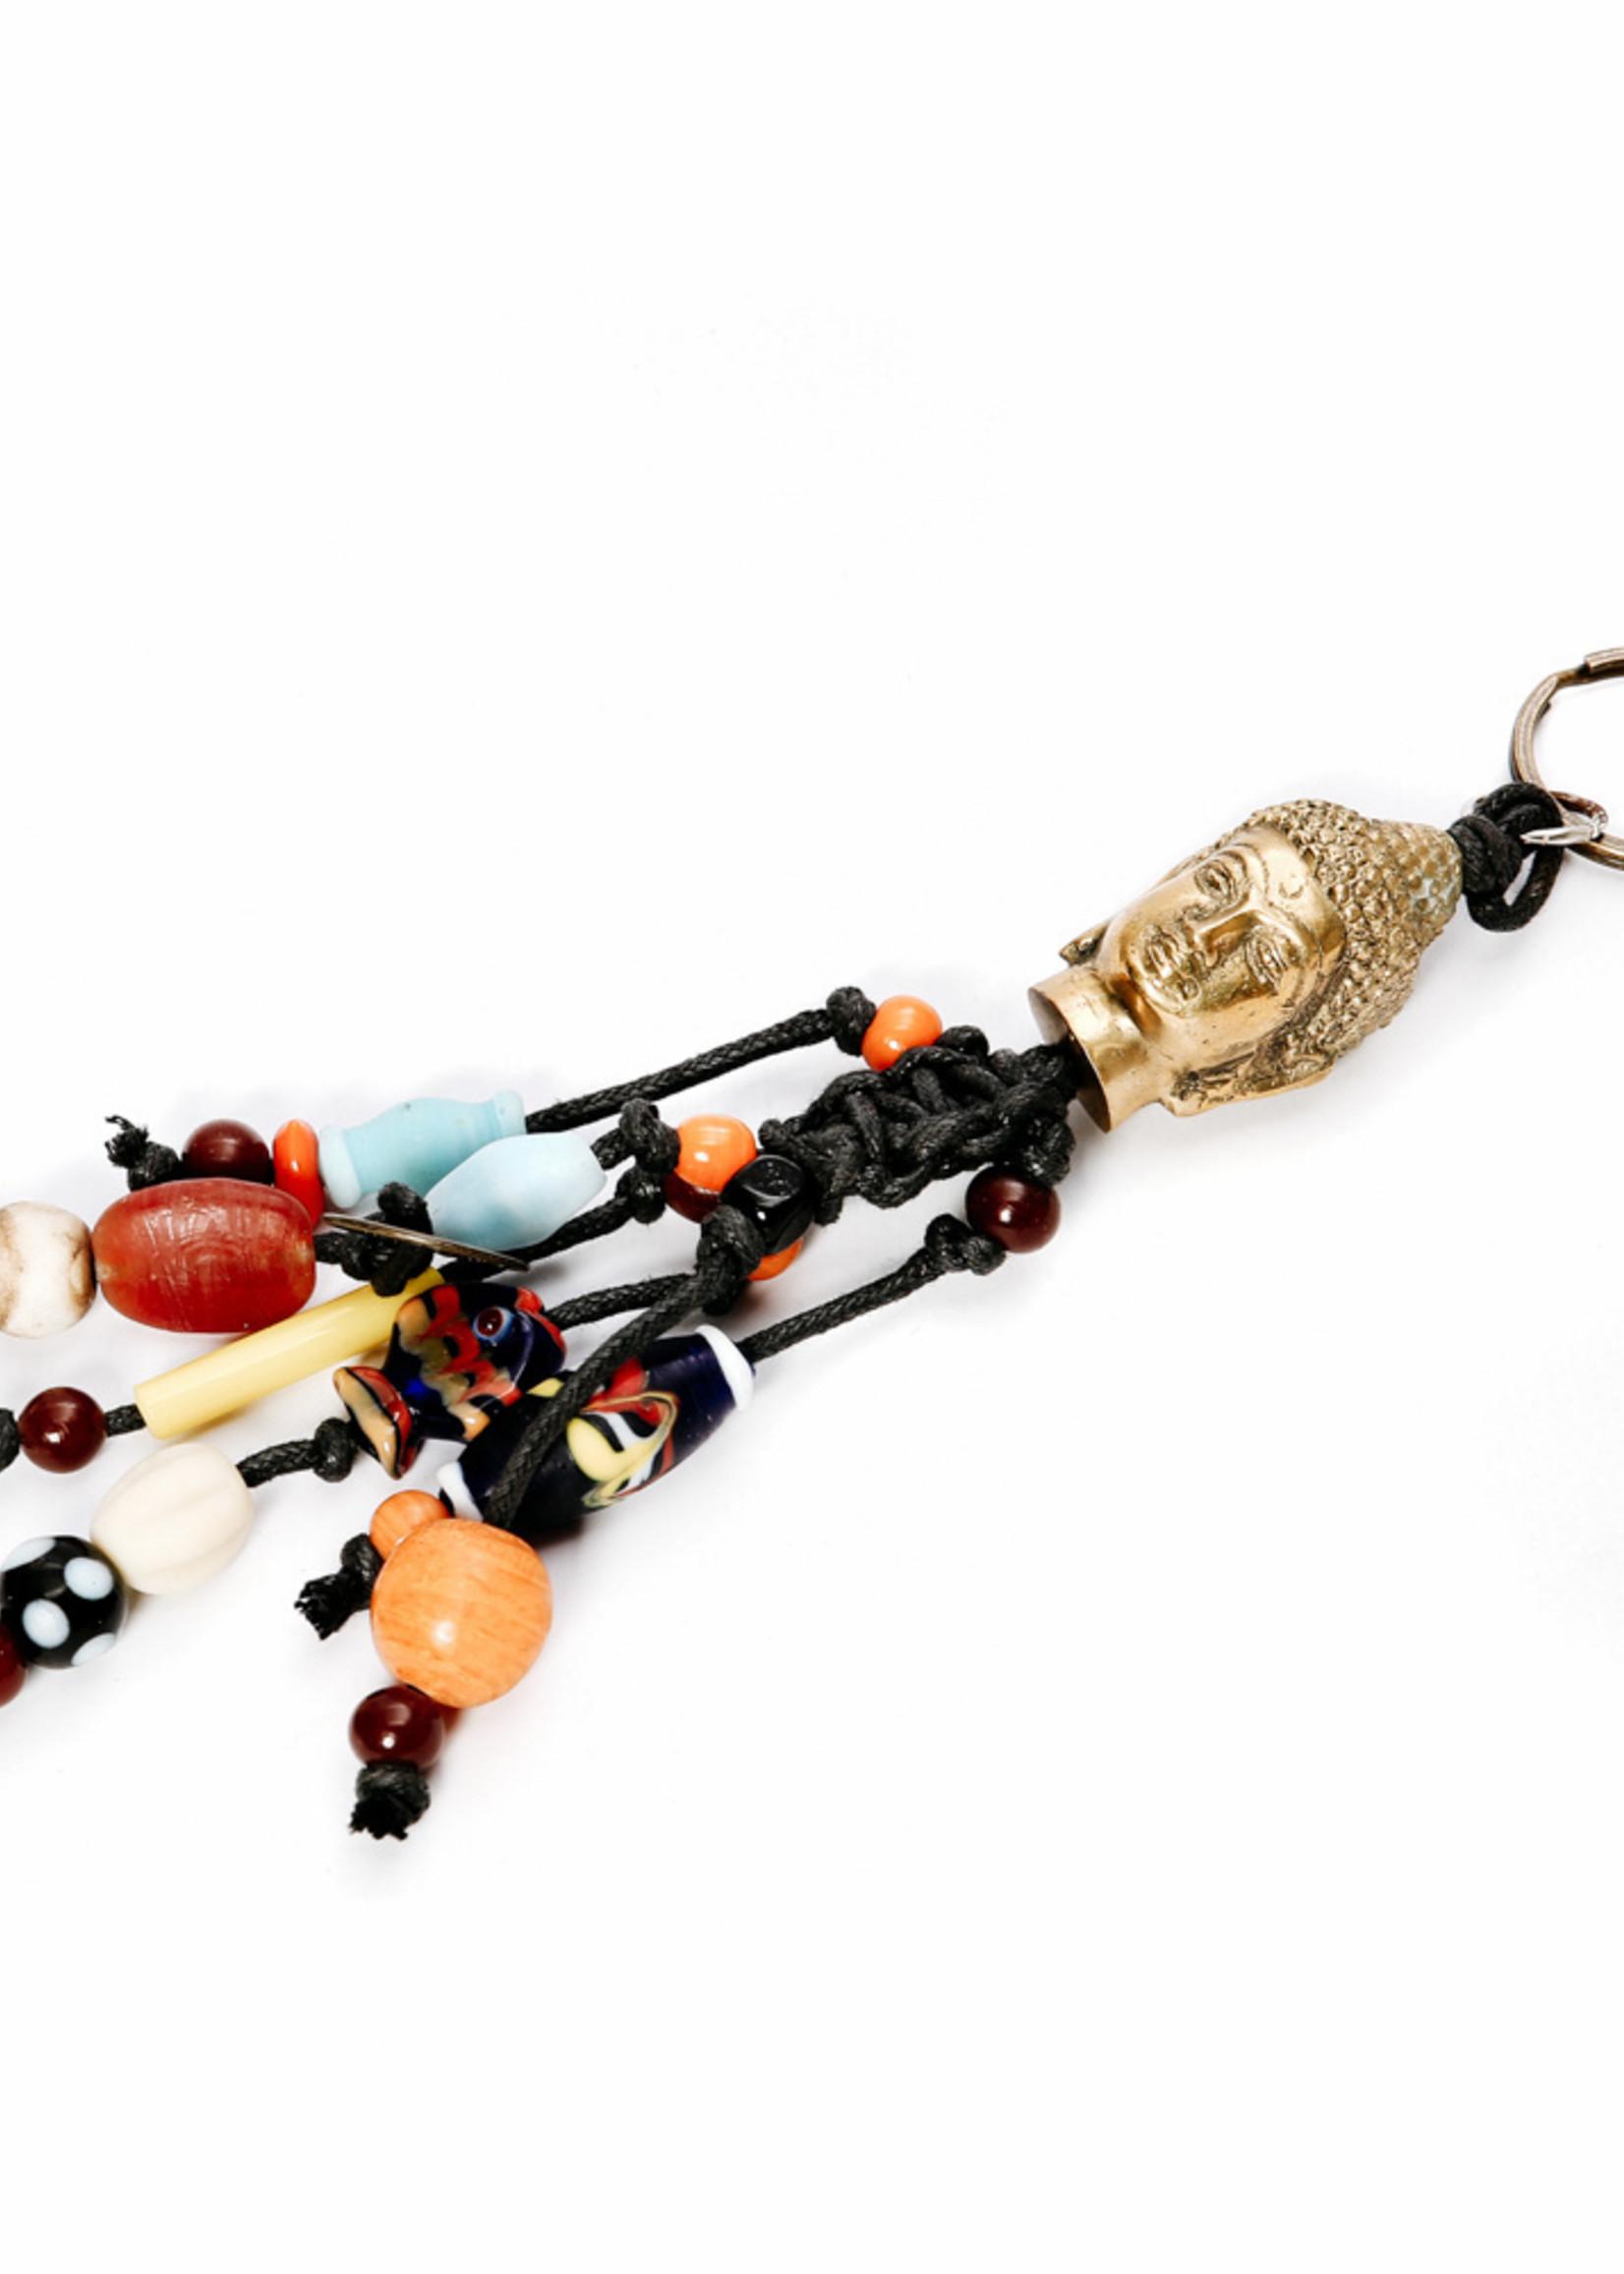 The Boho Buddha Keychain - Black